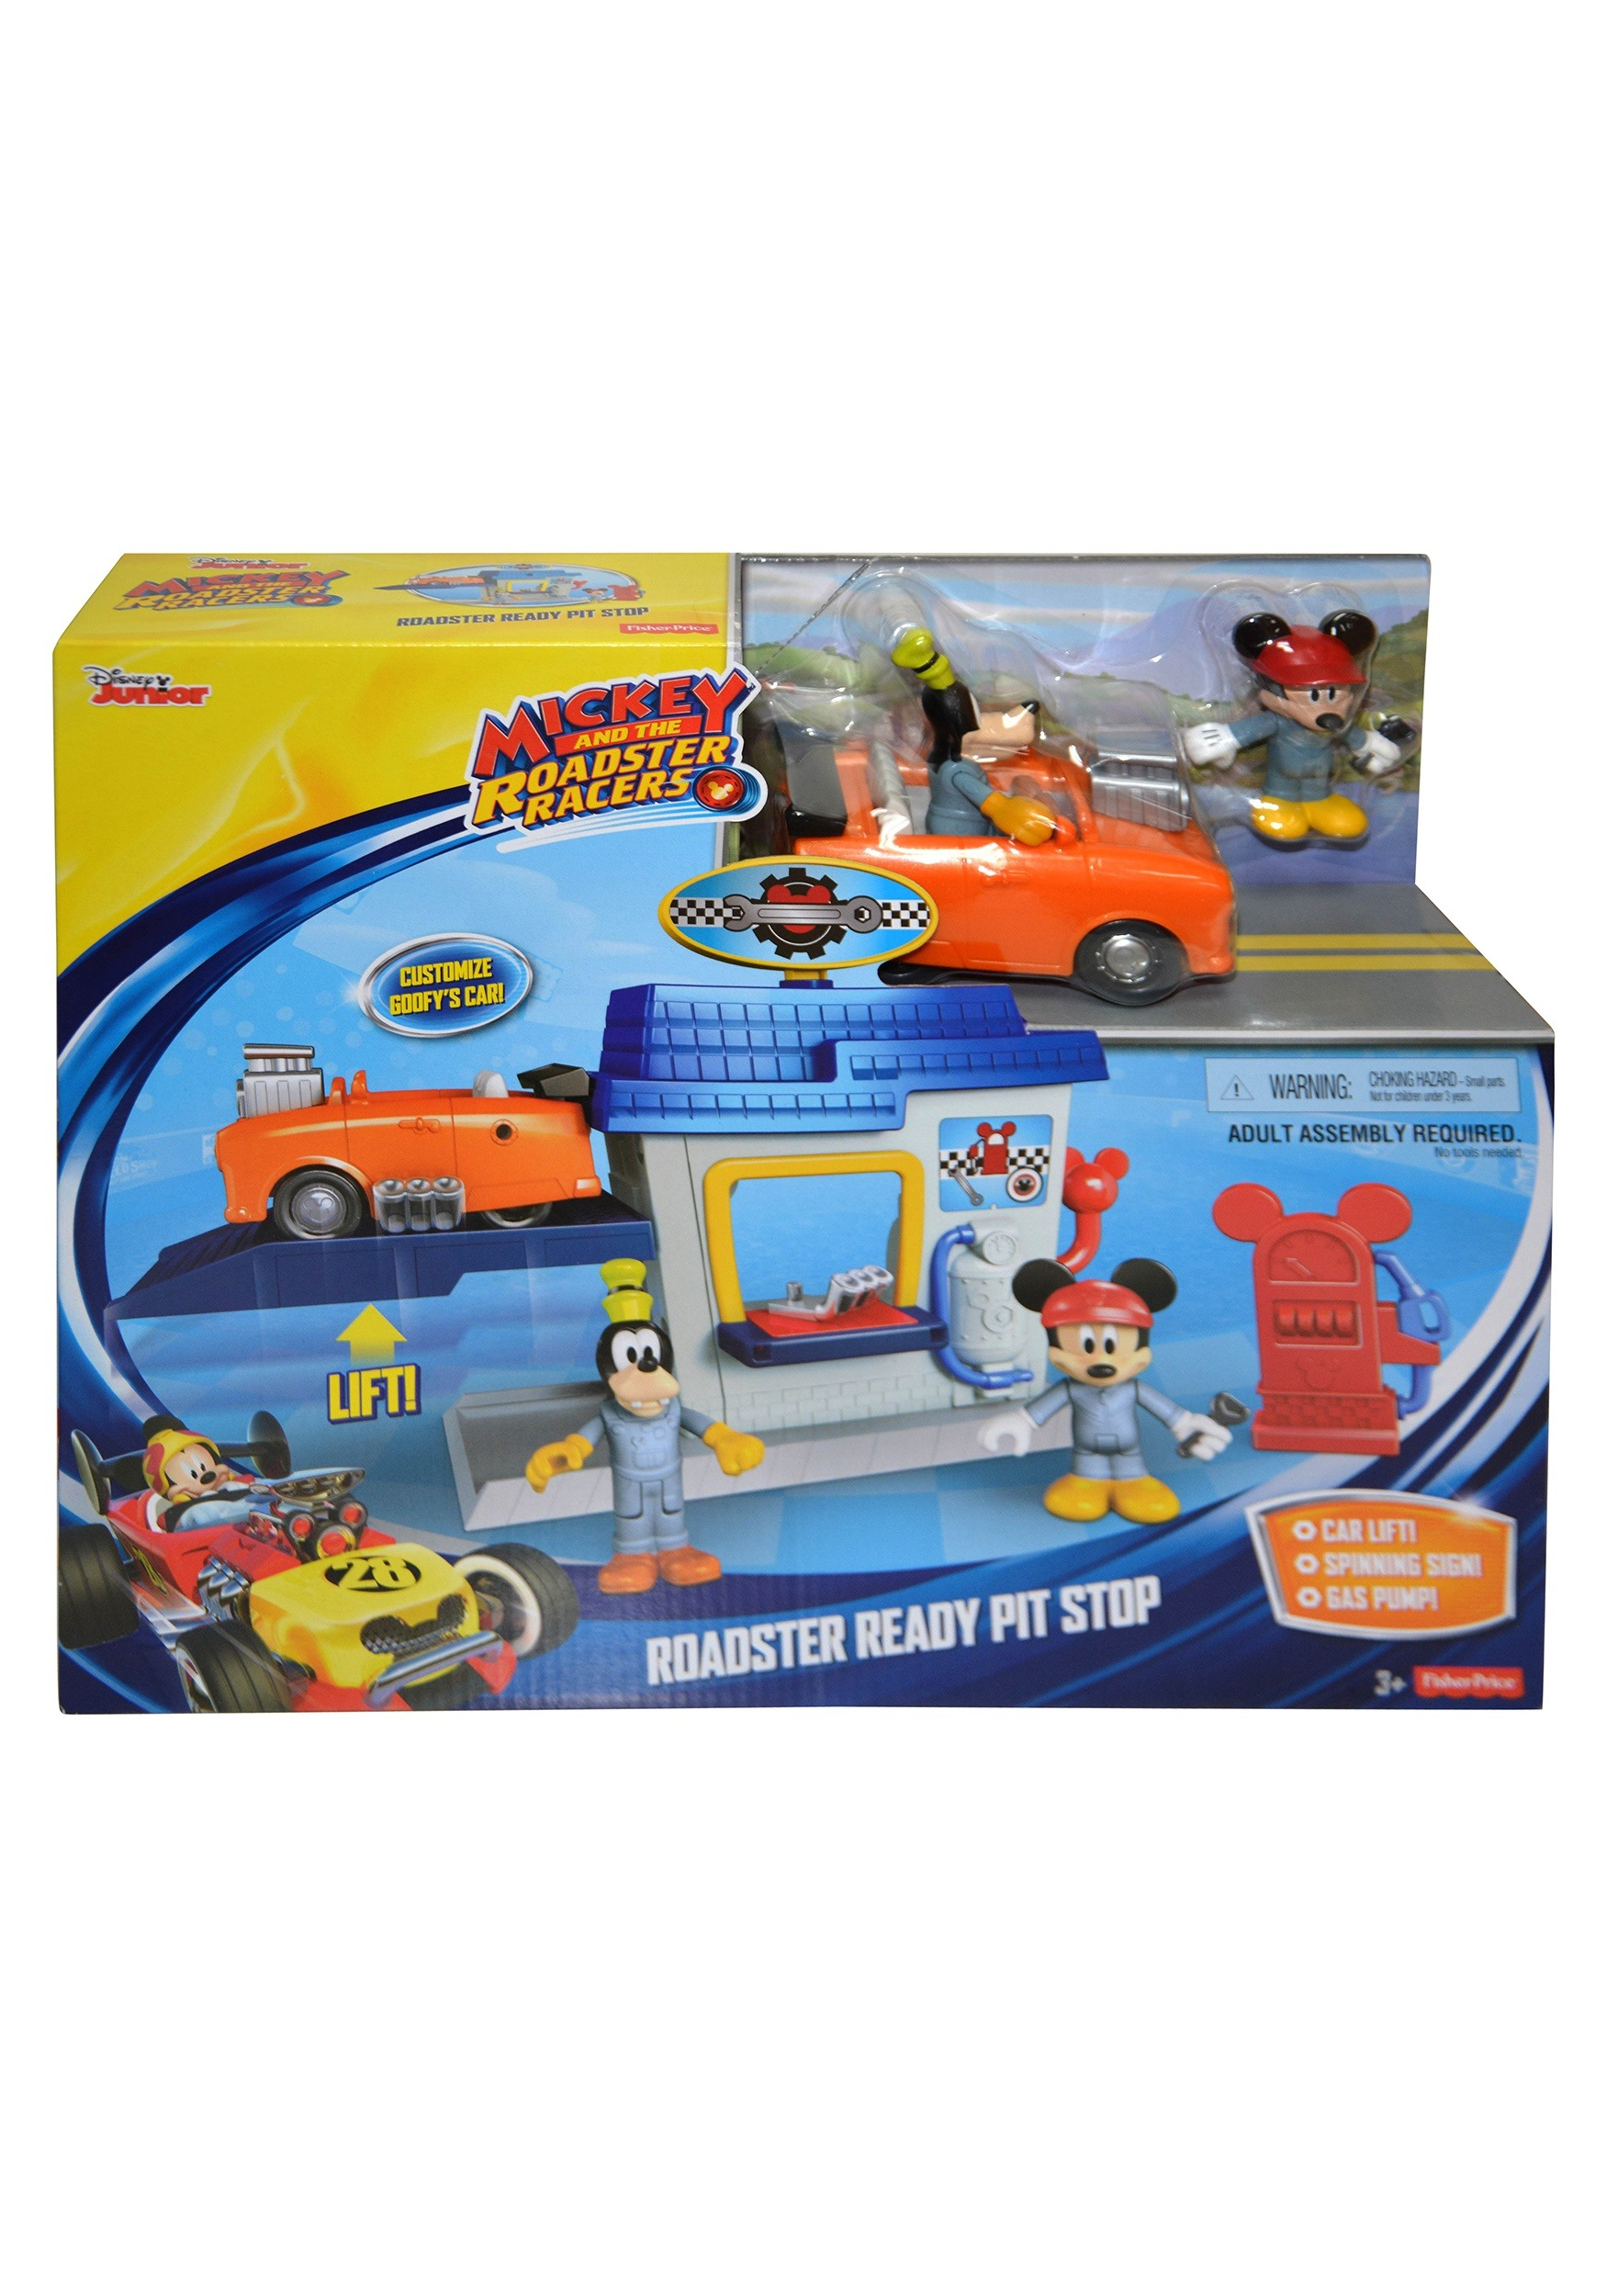 Disney Junior Mickey Roadster Racers Toys